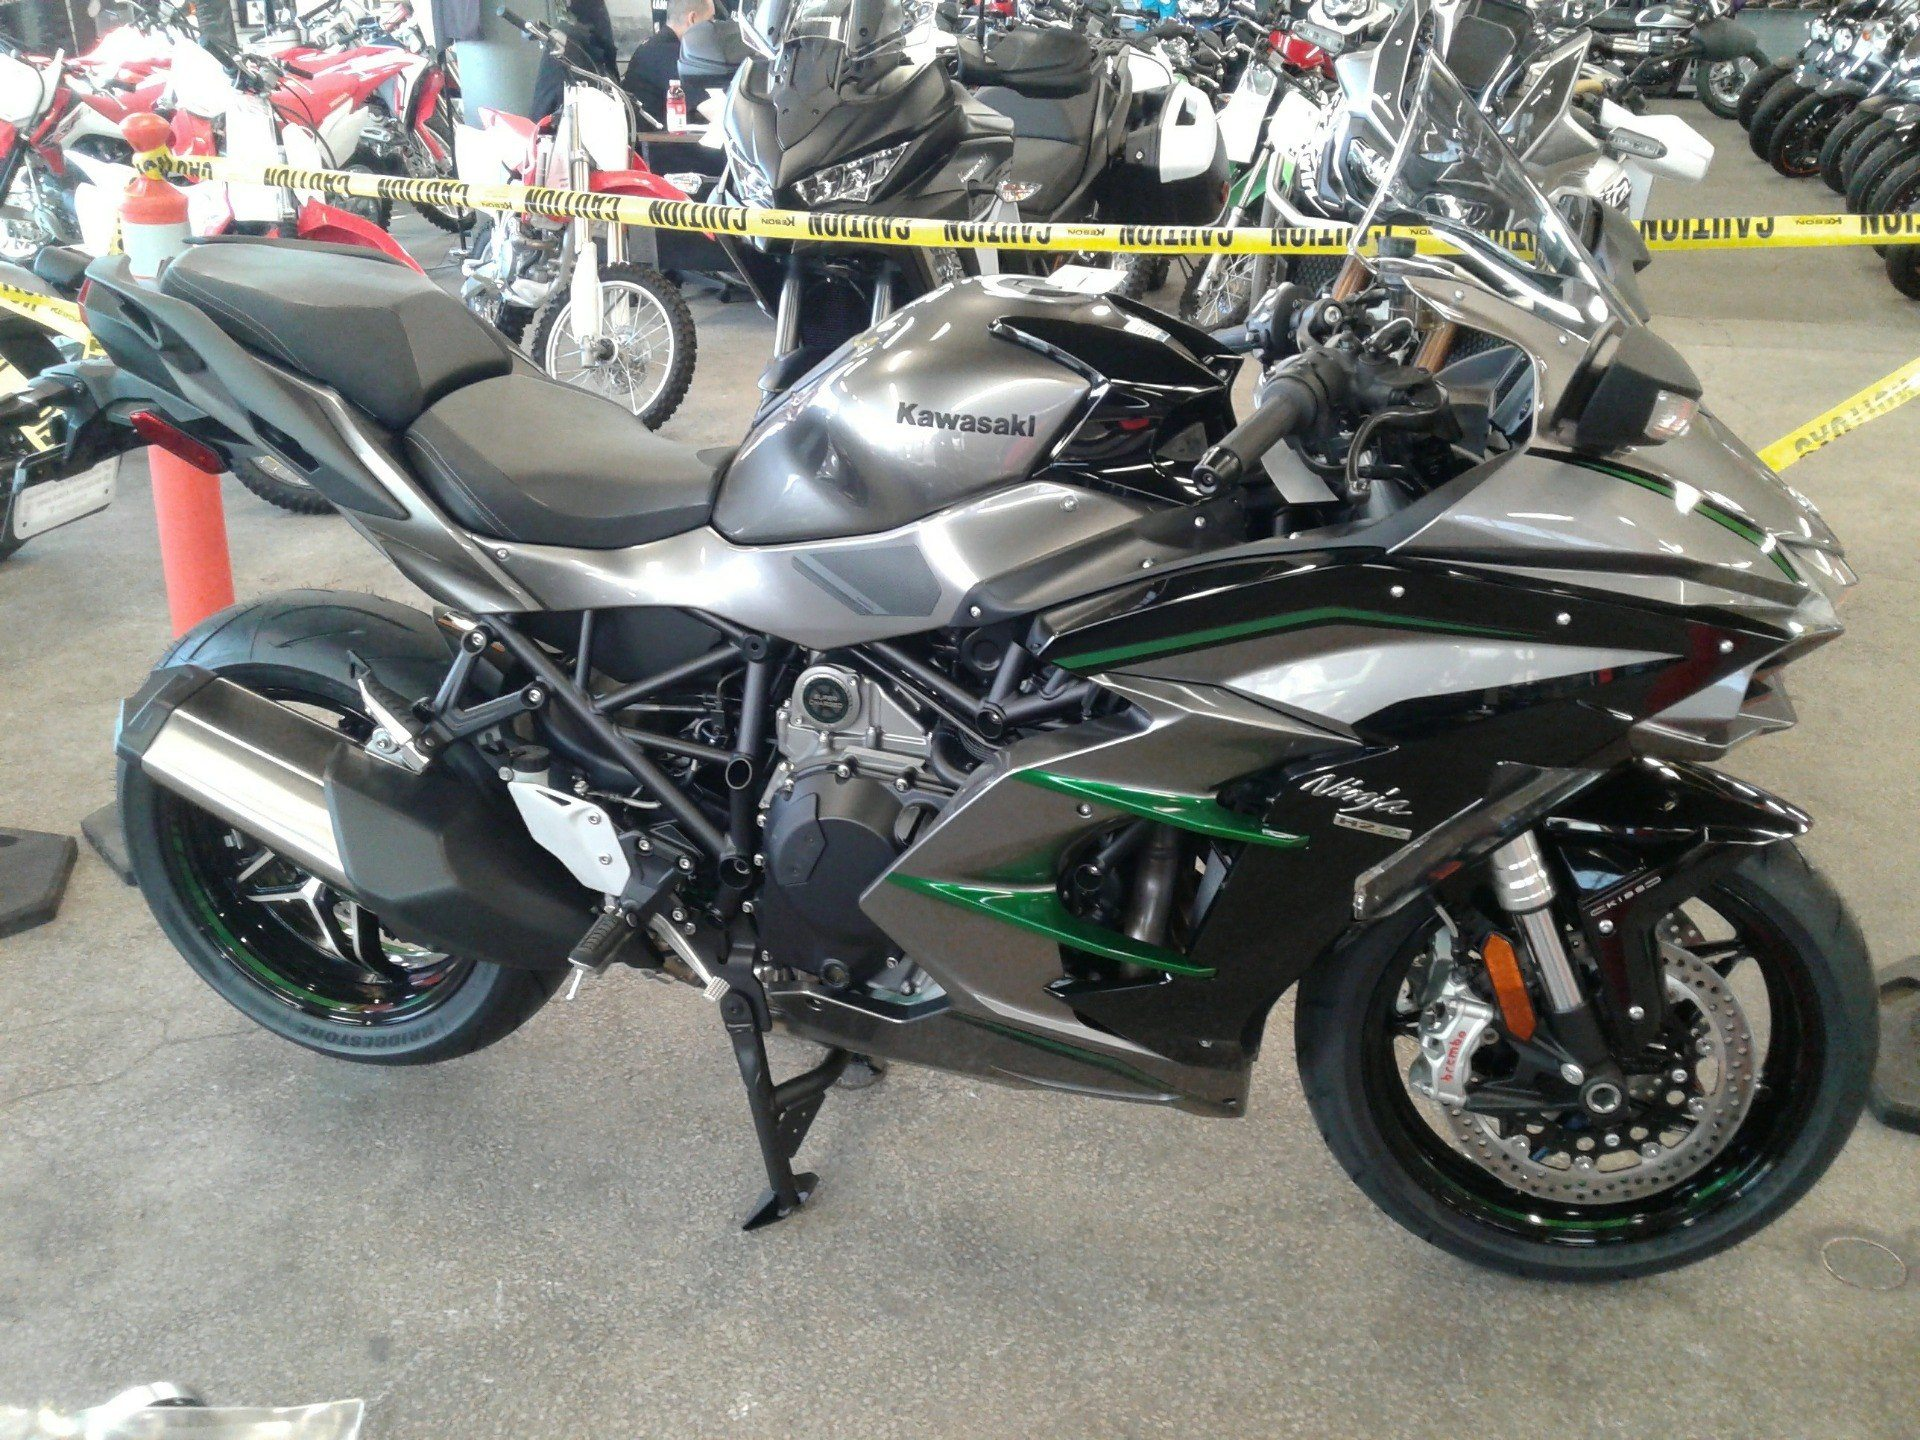 New 2019 Kawasaki Ninja H2 Sx Se Motorcycles In Bakersfield Ca